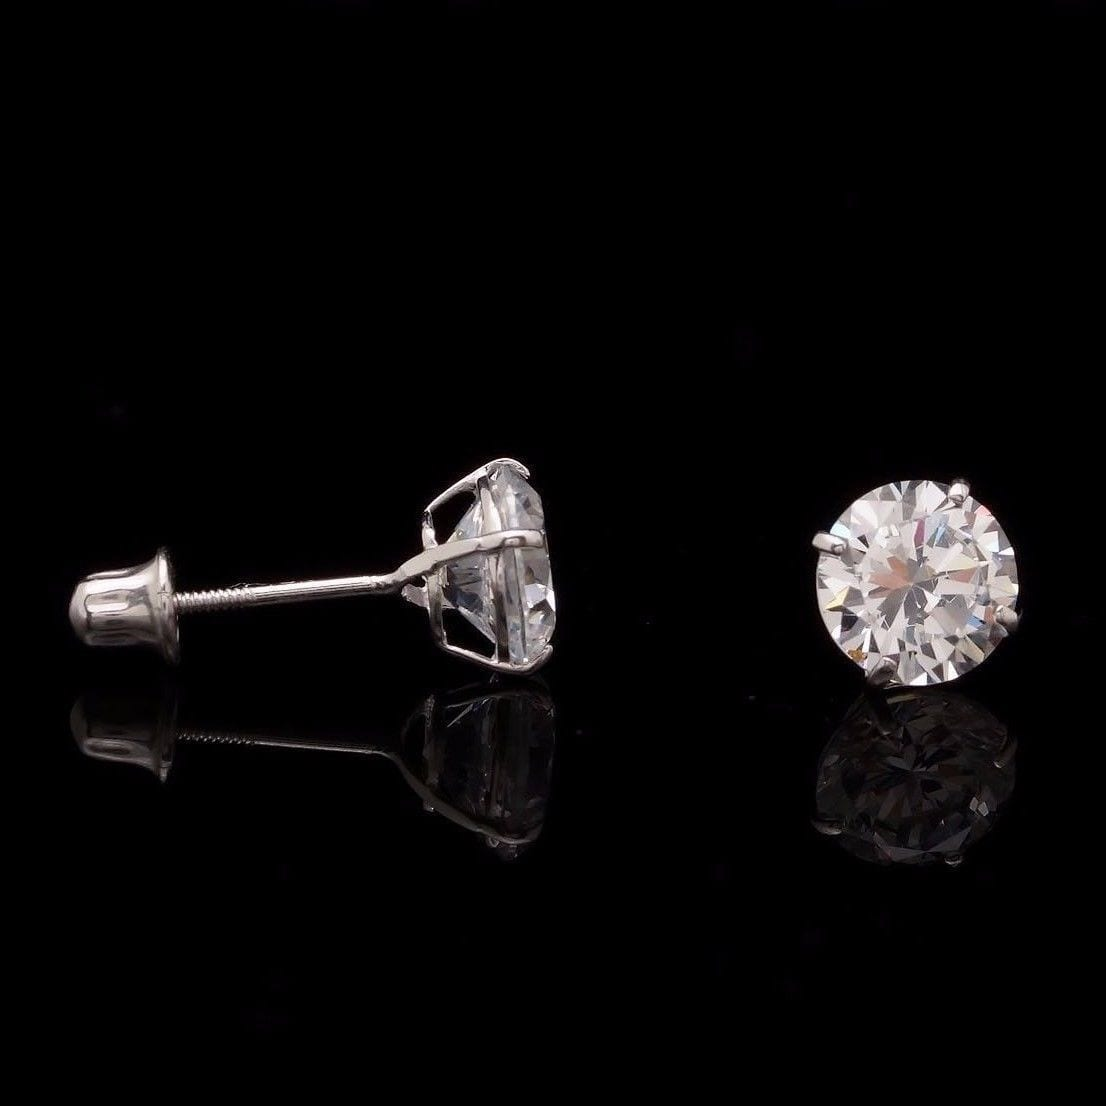 Man Made Diamond Stud Earrings Uk